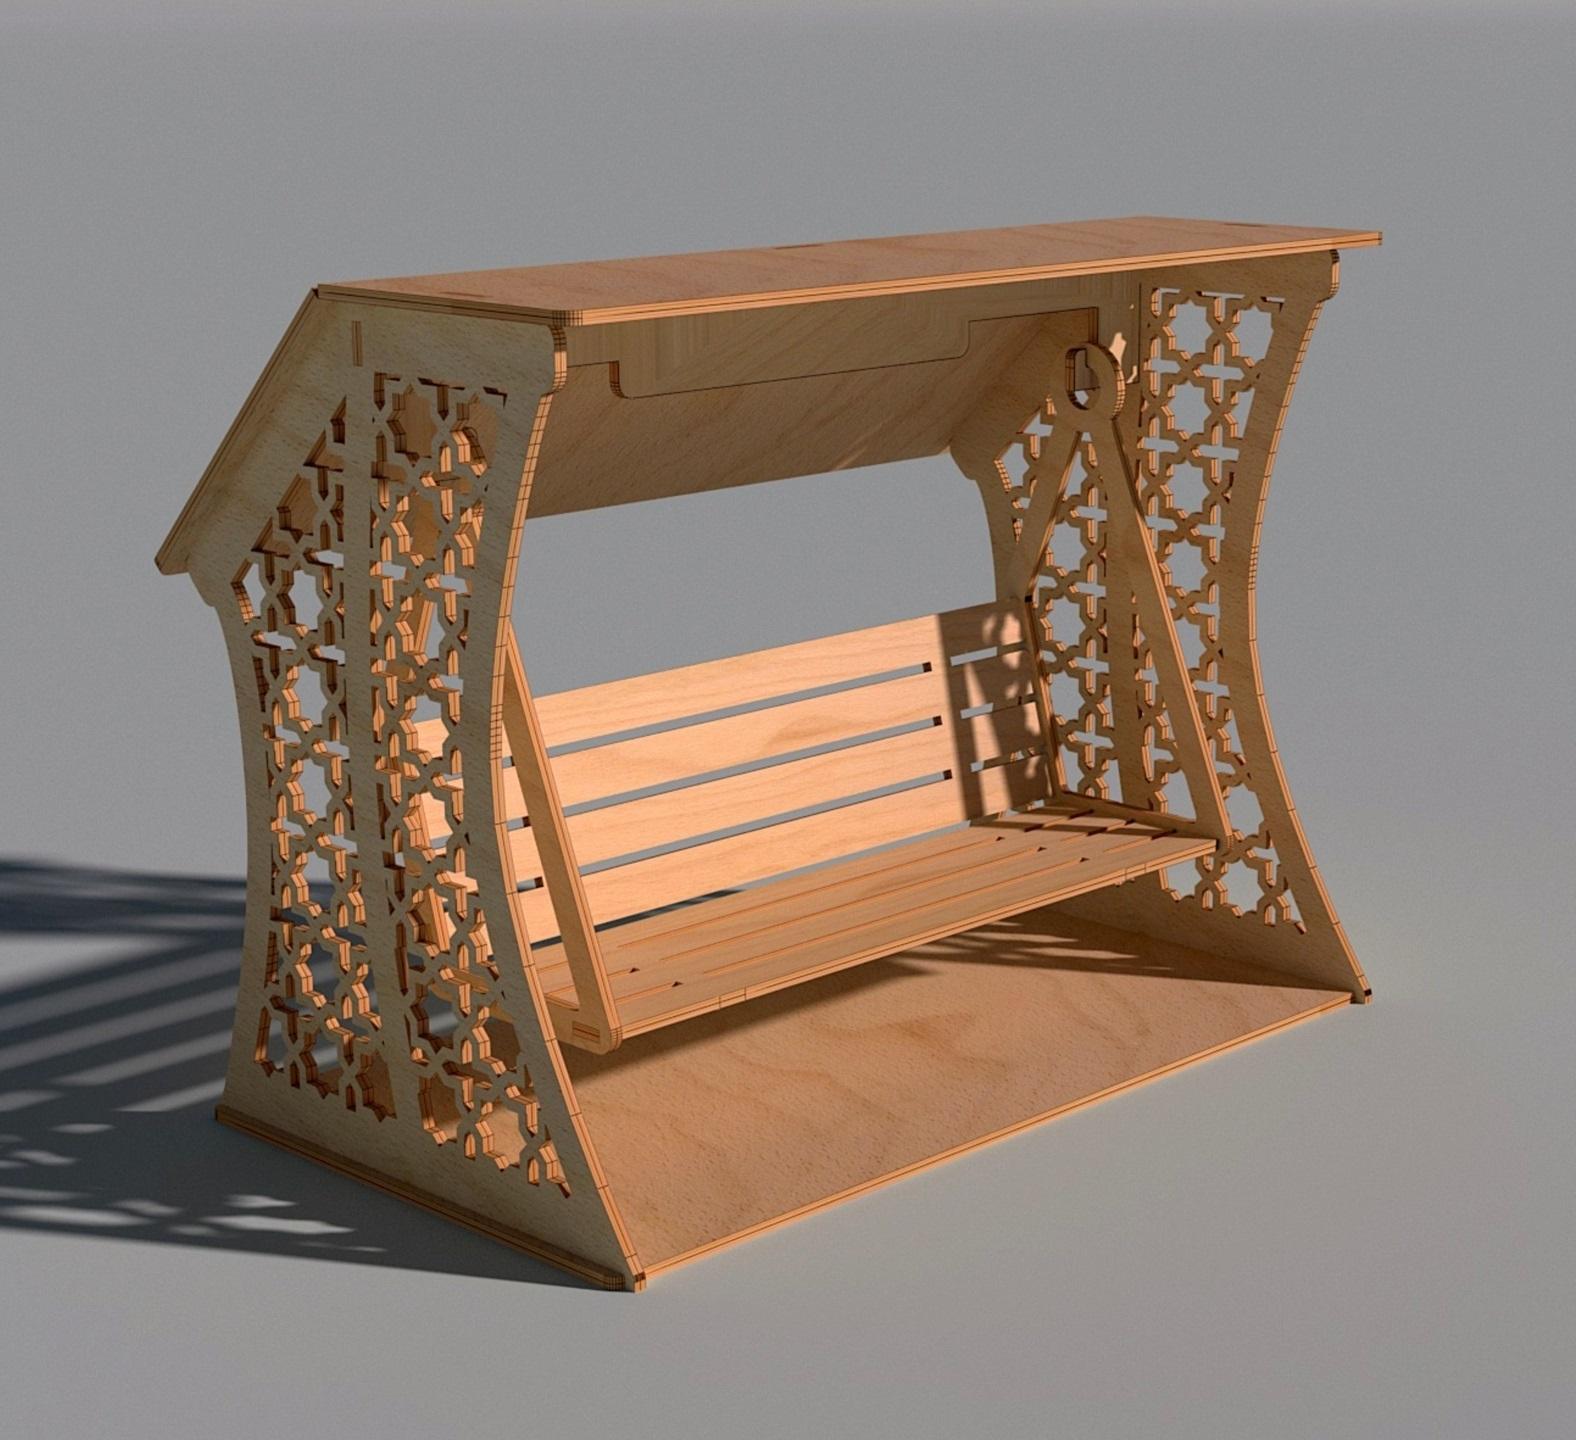 Laser Cut Wooden Decorative Swing Free Vector